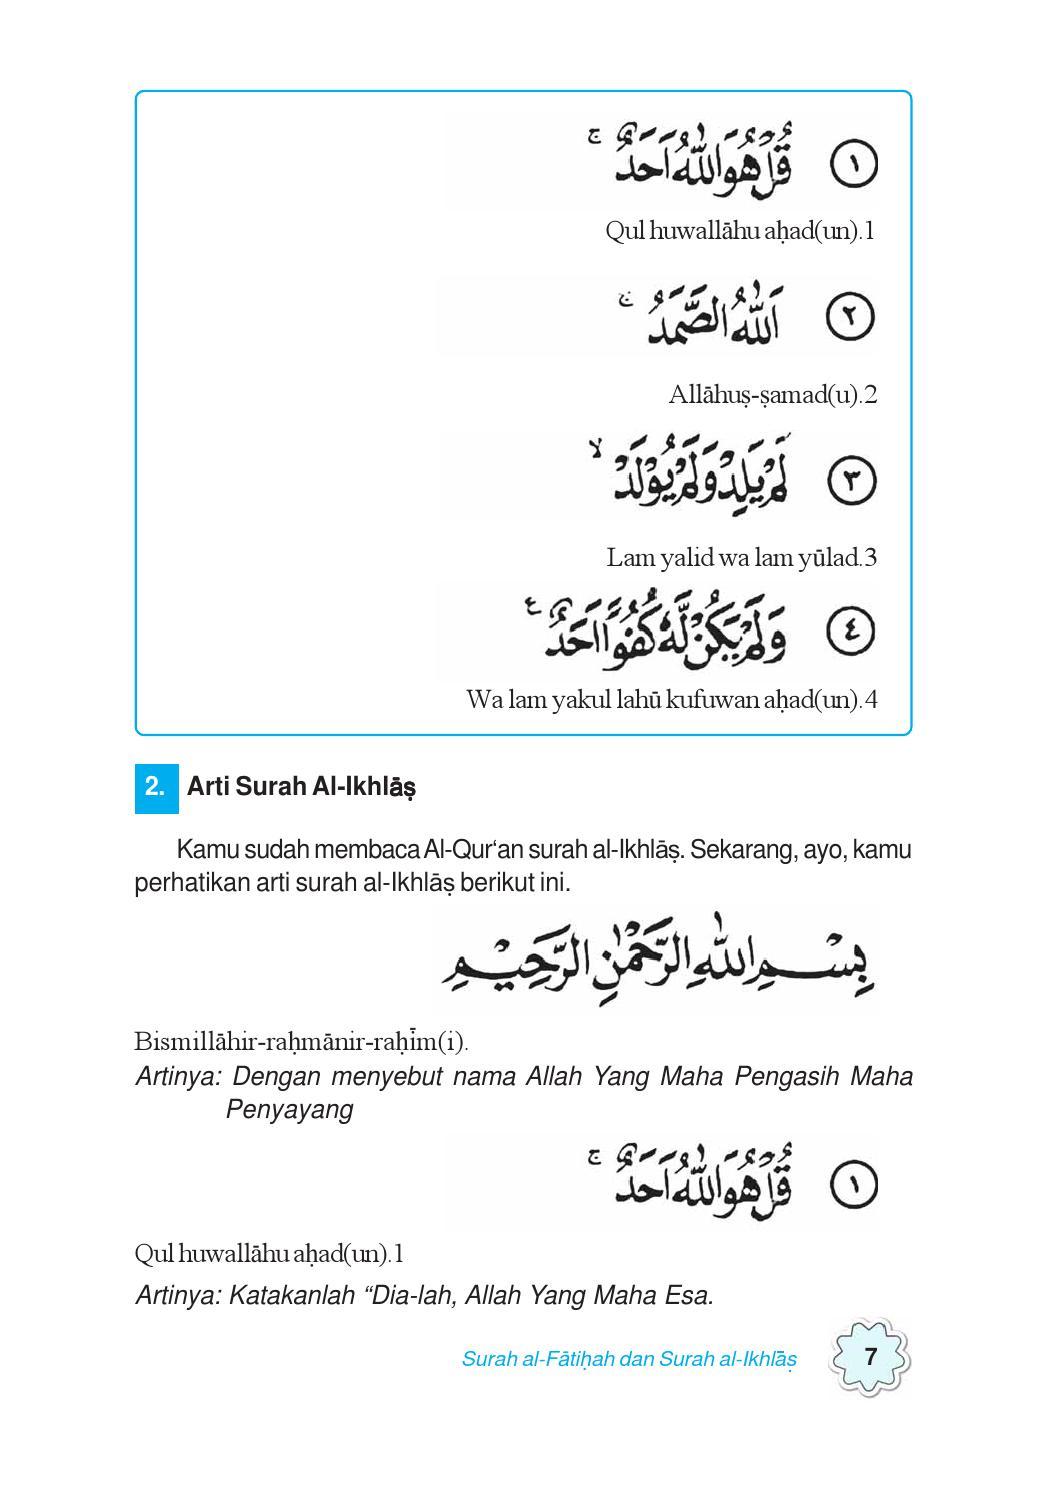 Surah Al Ikhlas Dan Artinya : surah, ikhlas, artinya, Pendidikan, Agama, Islam, Untuk, Kelas, Sekar, Galuh, Endah, Pinuji, Lawuningrum, Nurwahid, Bimasakti, Issuu